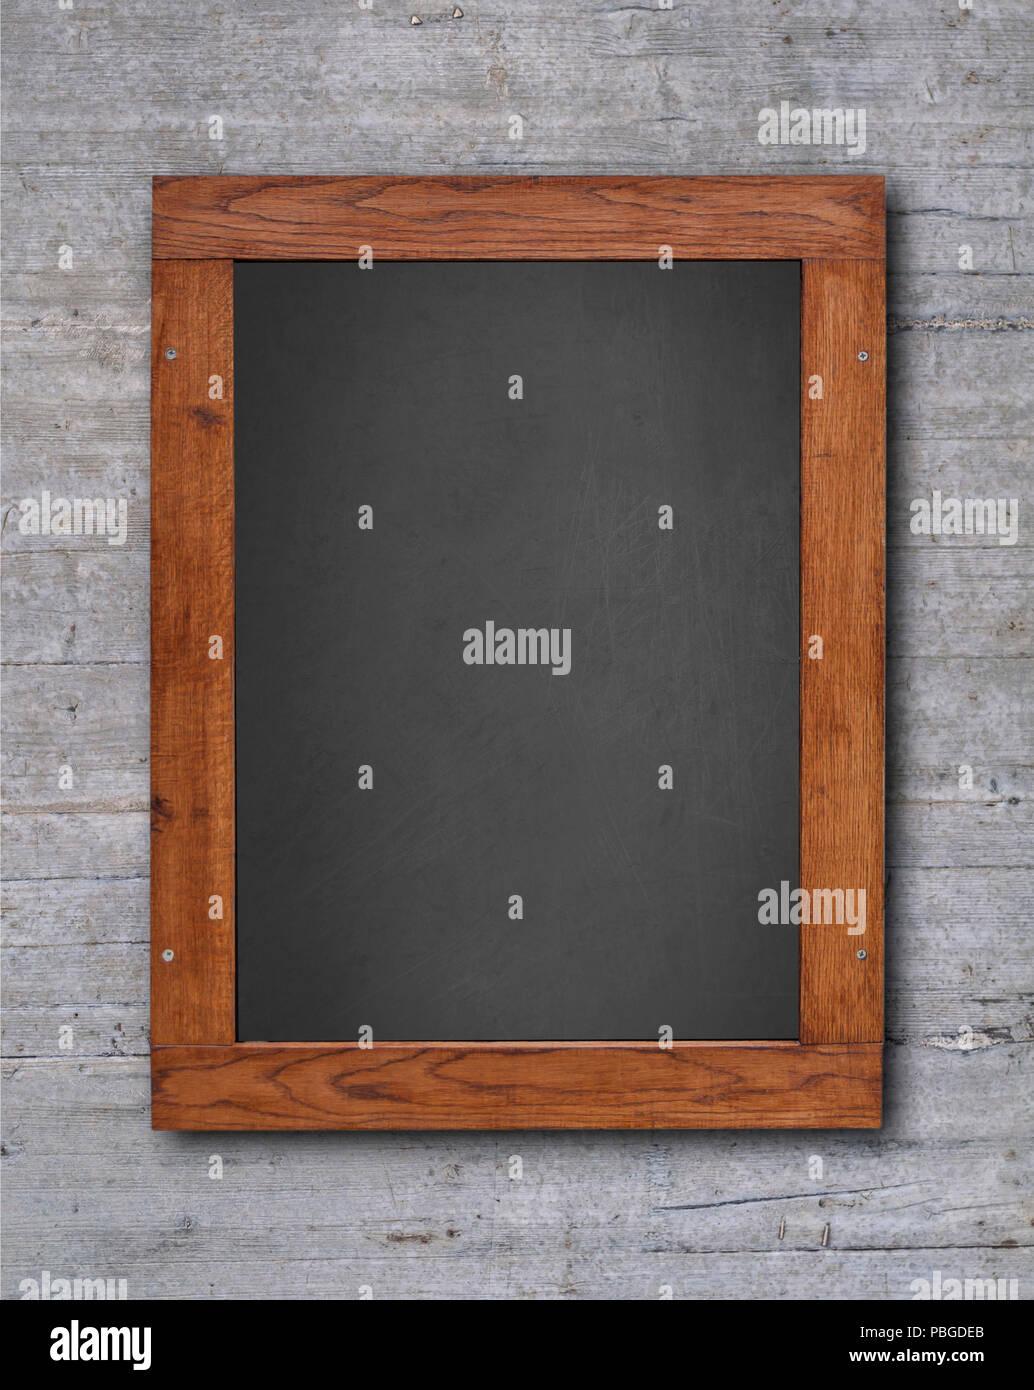 Blackboard in wooden frame on wall Stock Photo: 213647459 - Alamy